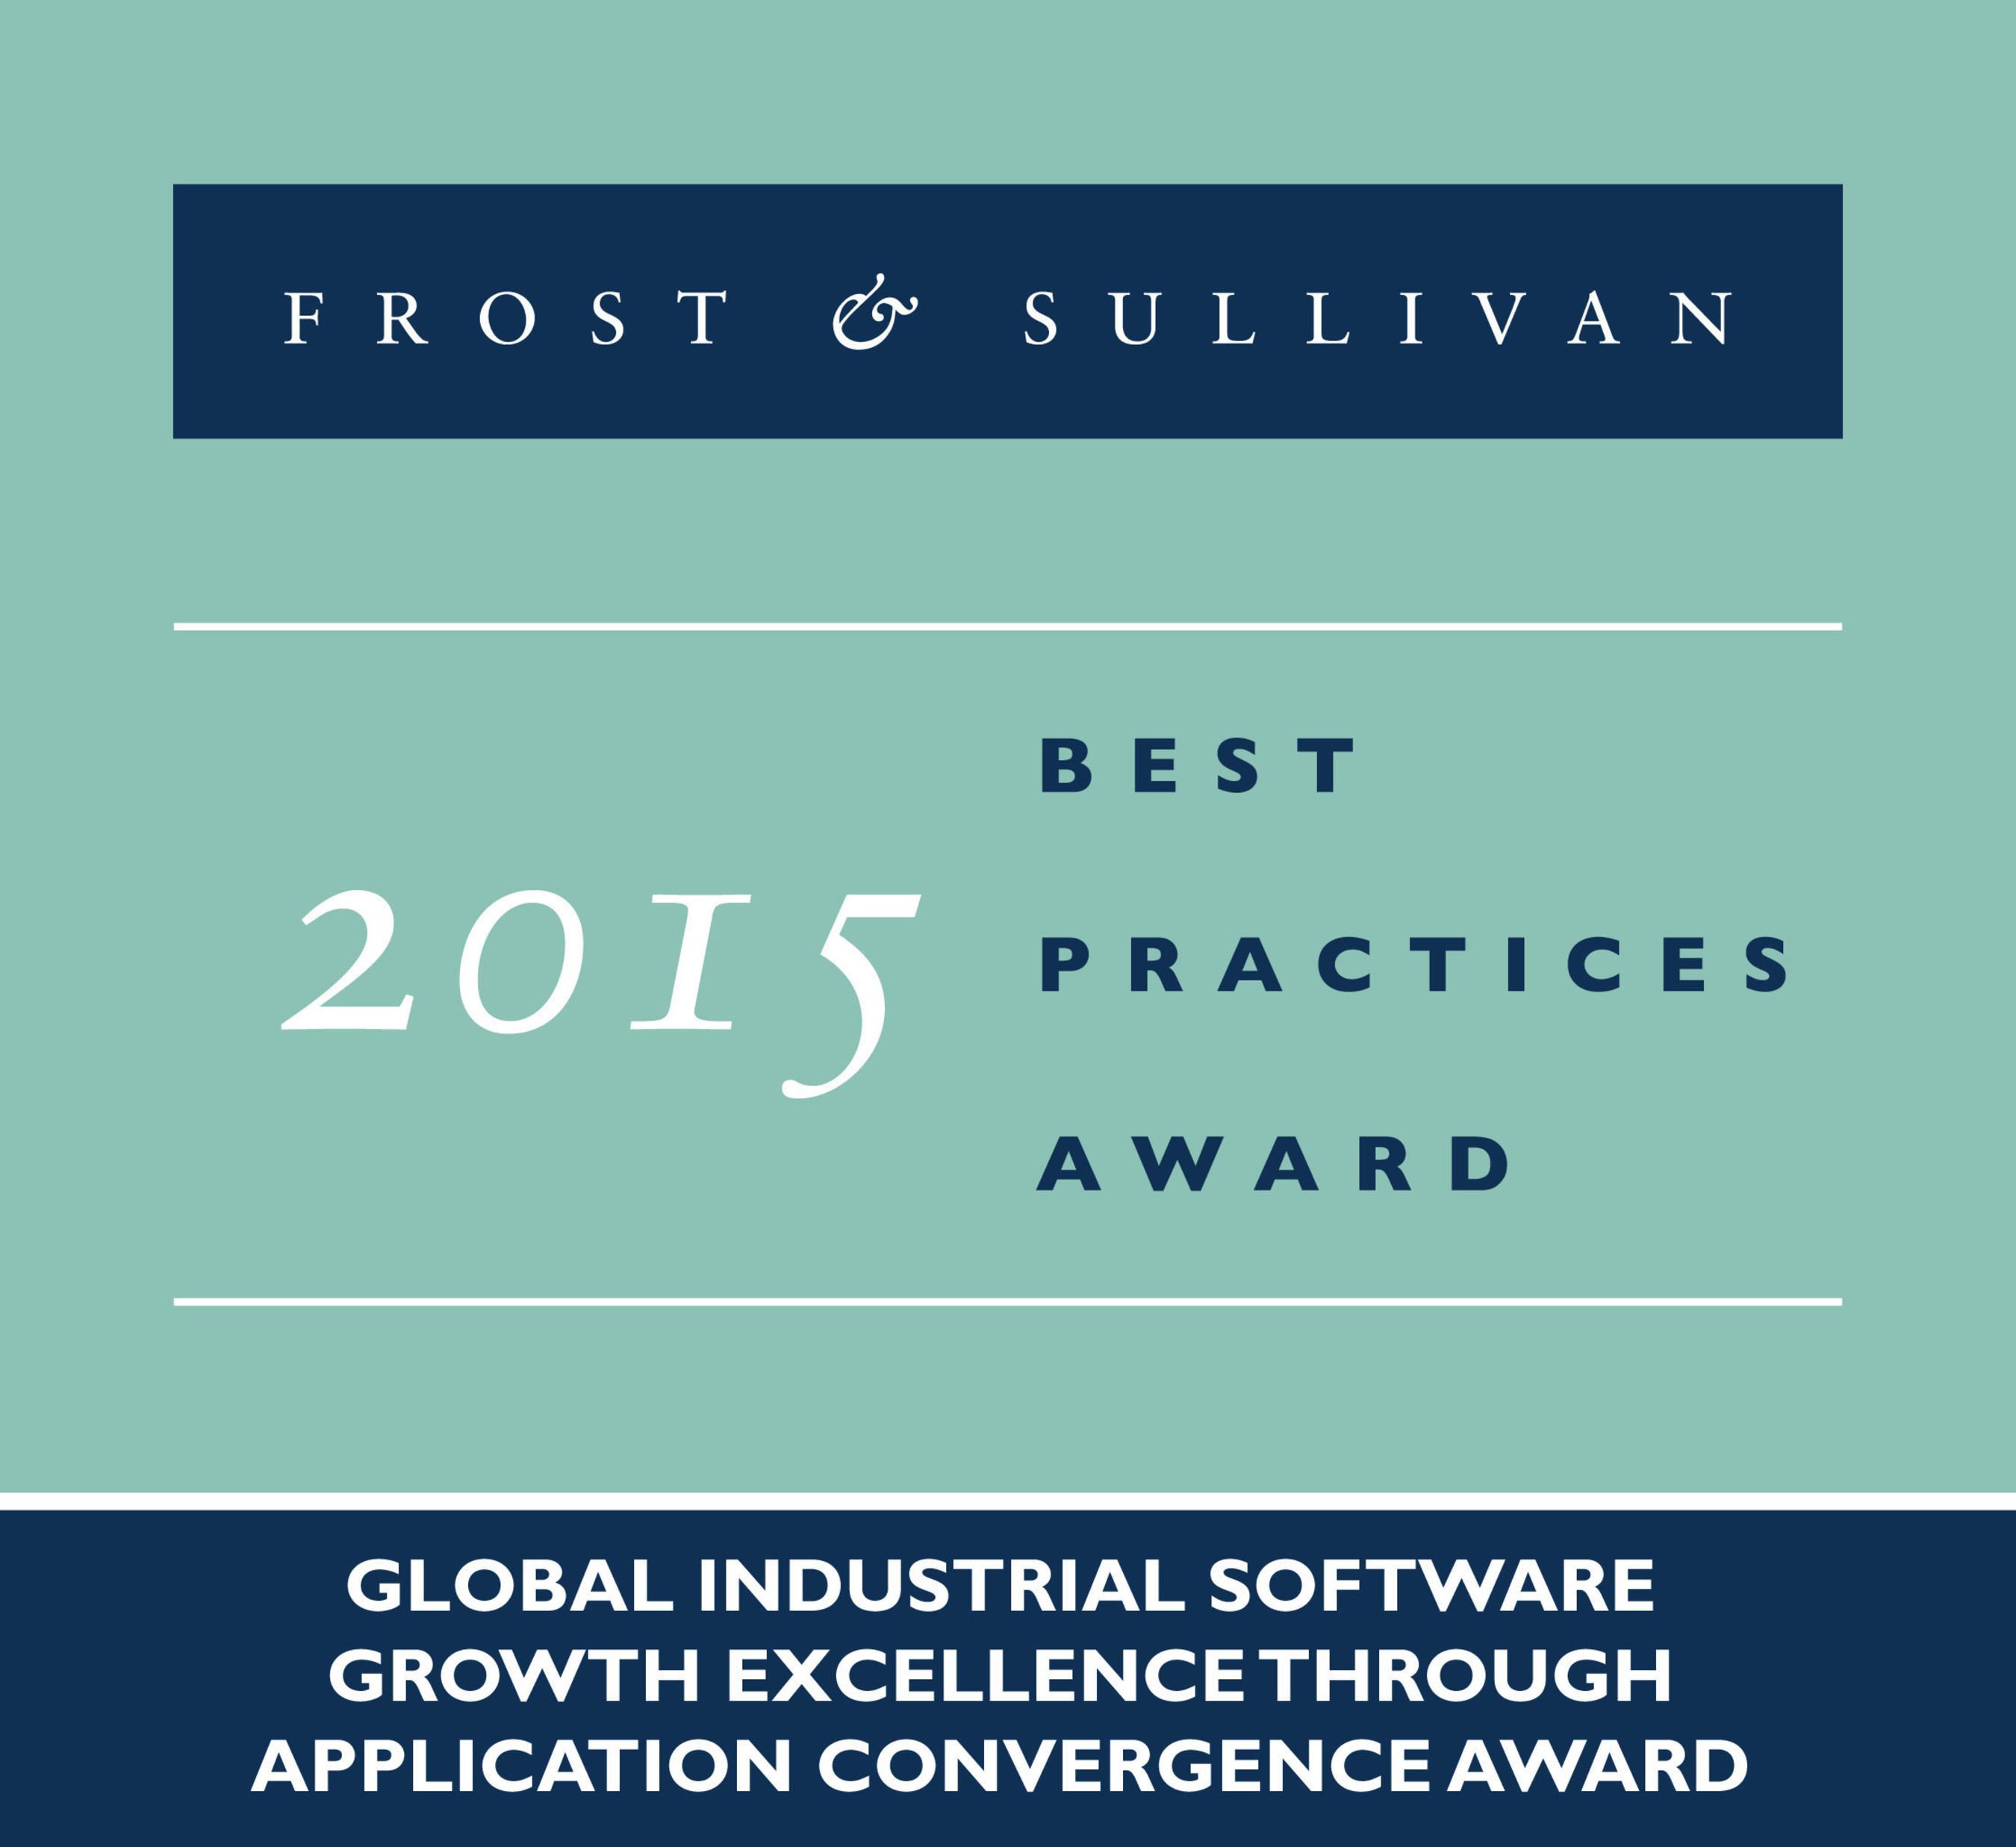 Frost & Sullivan Lauds GE for Developing an Innovative Software Technology Platform Designed for